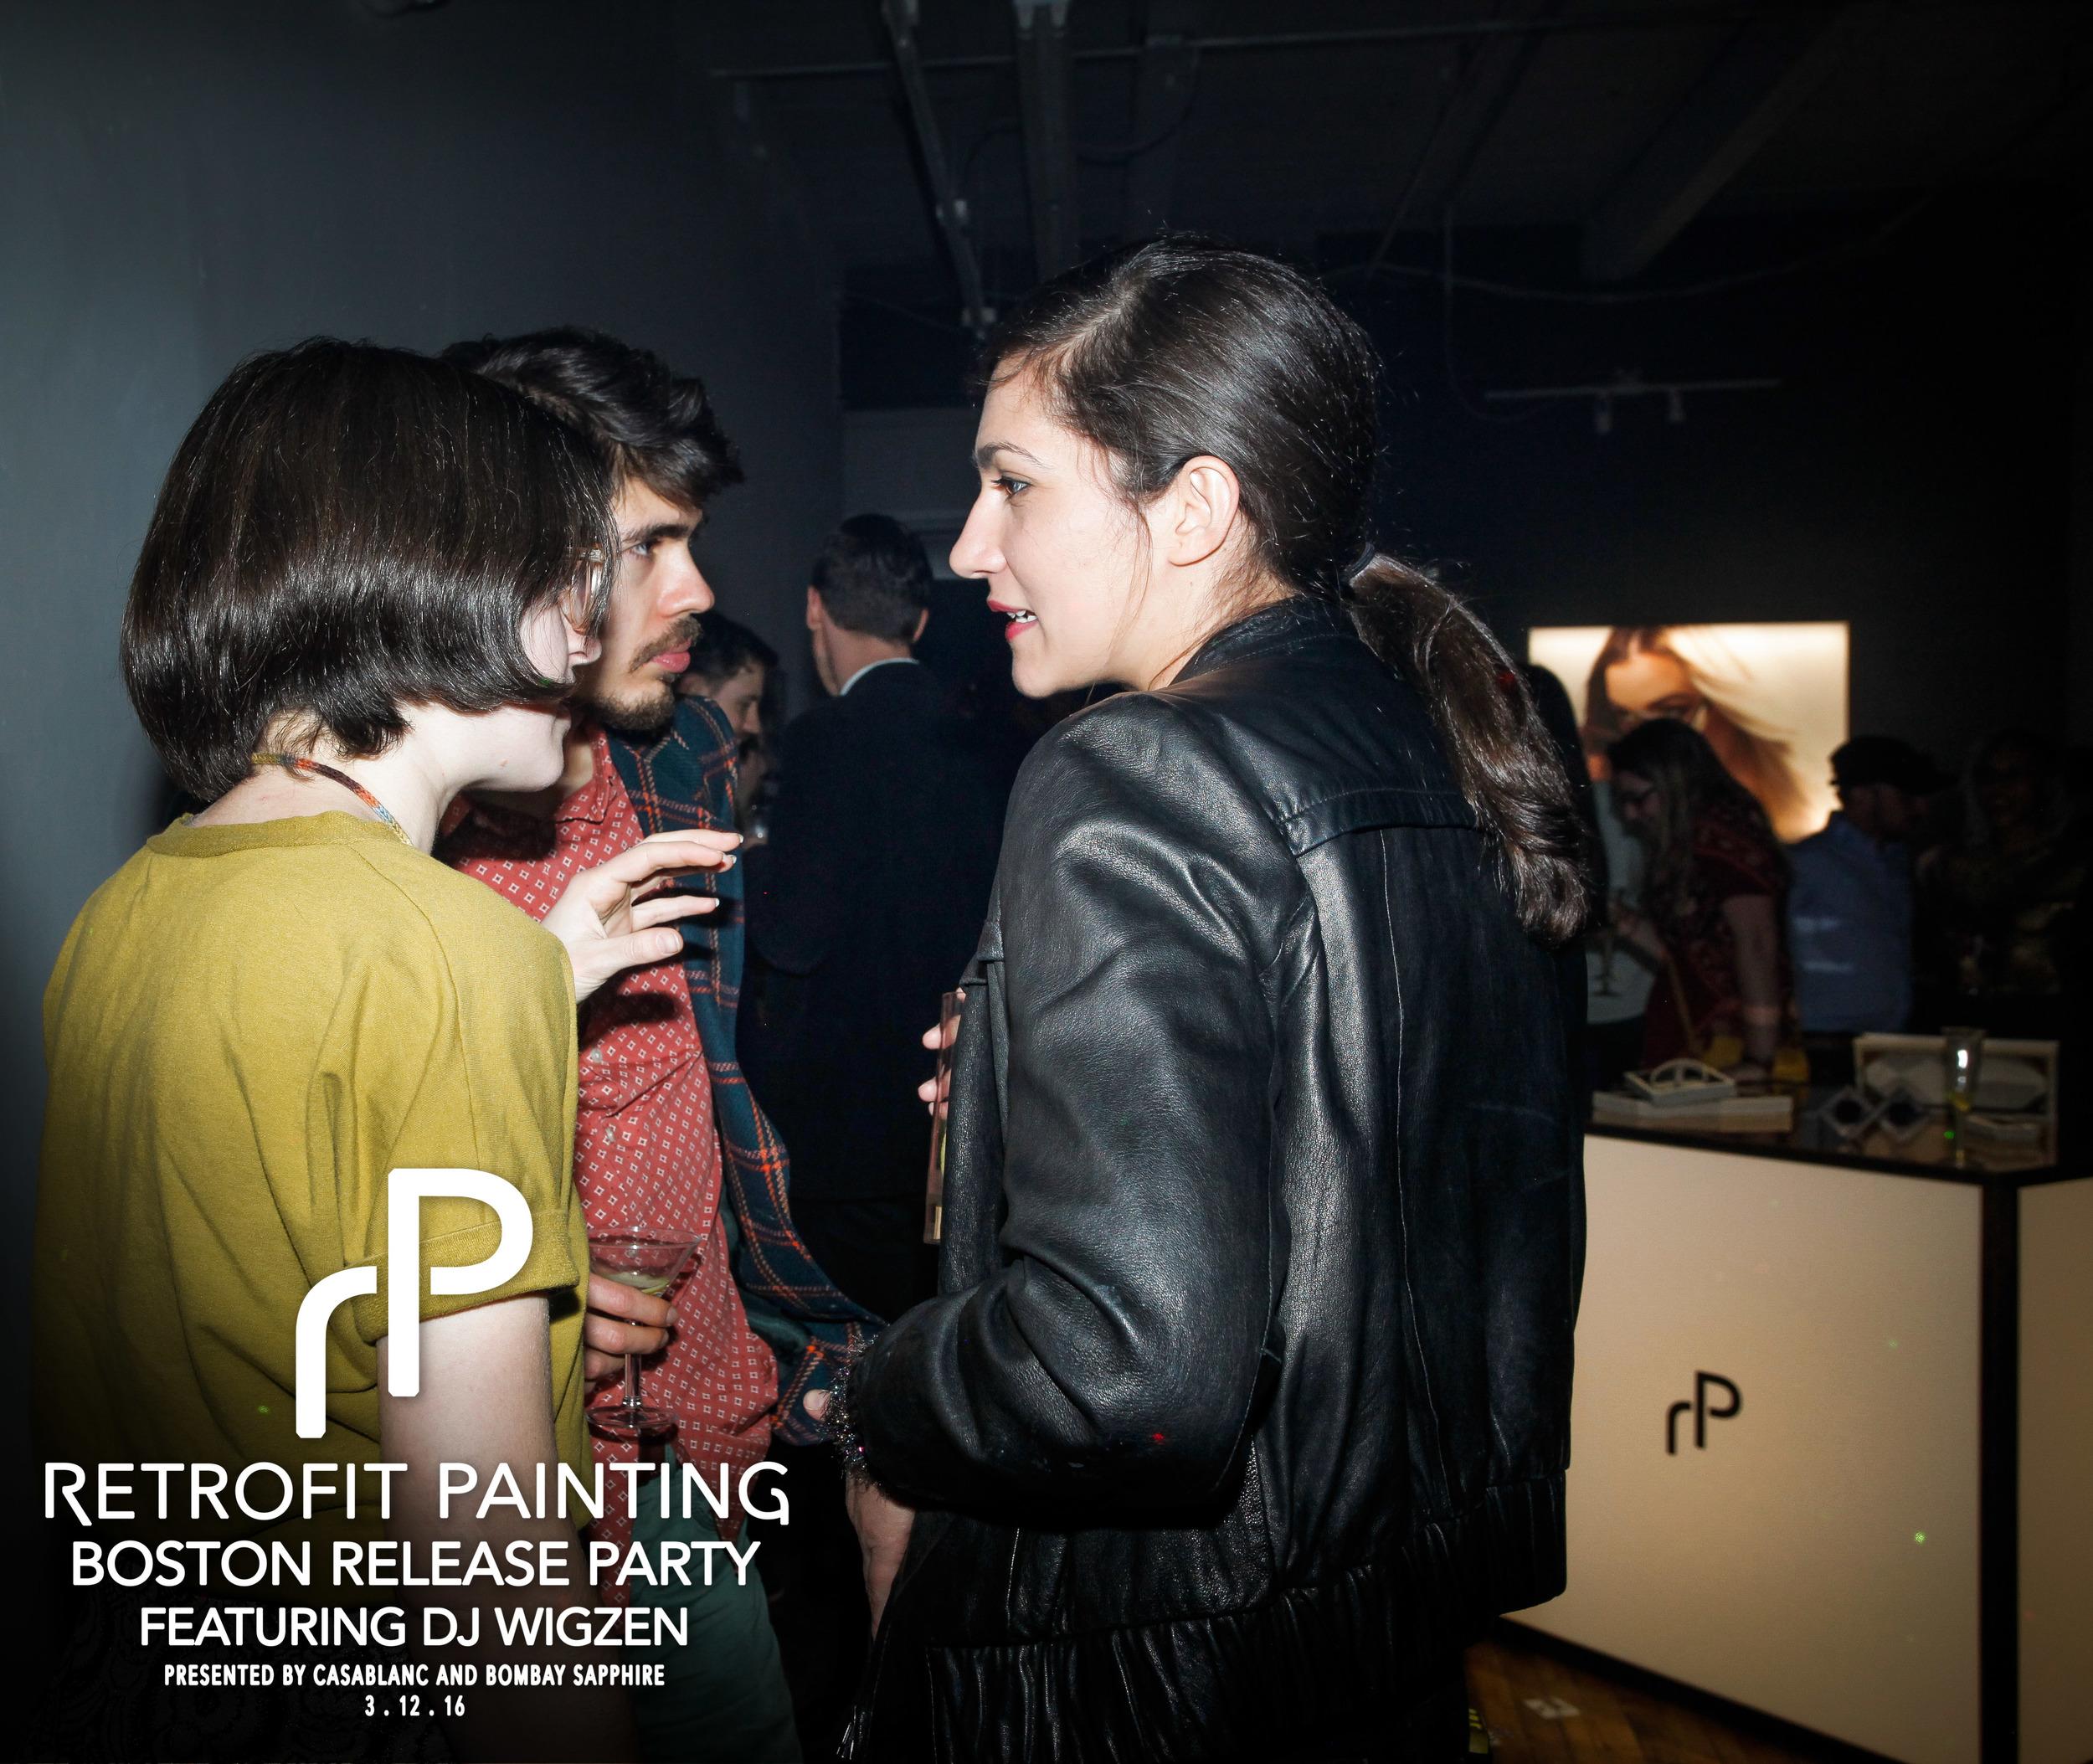 Retrofit Painting Boston Release Party 0031.jpg